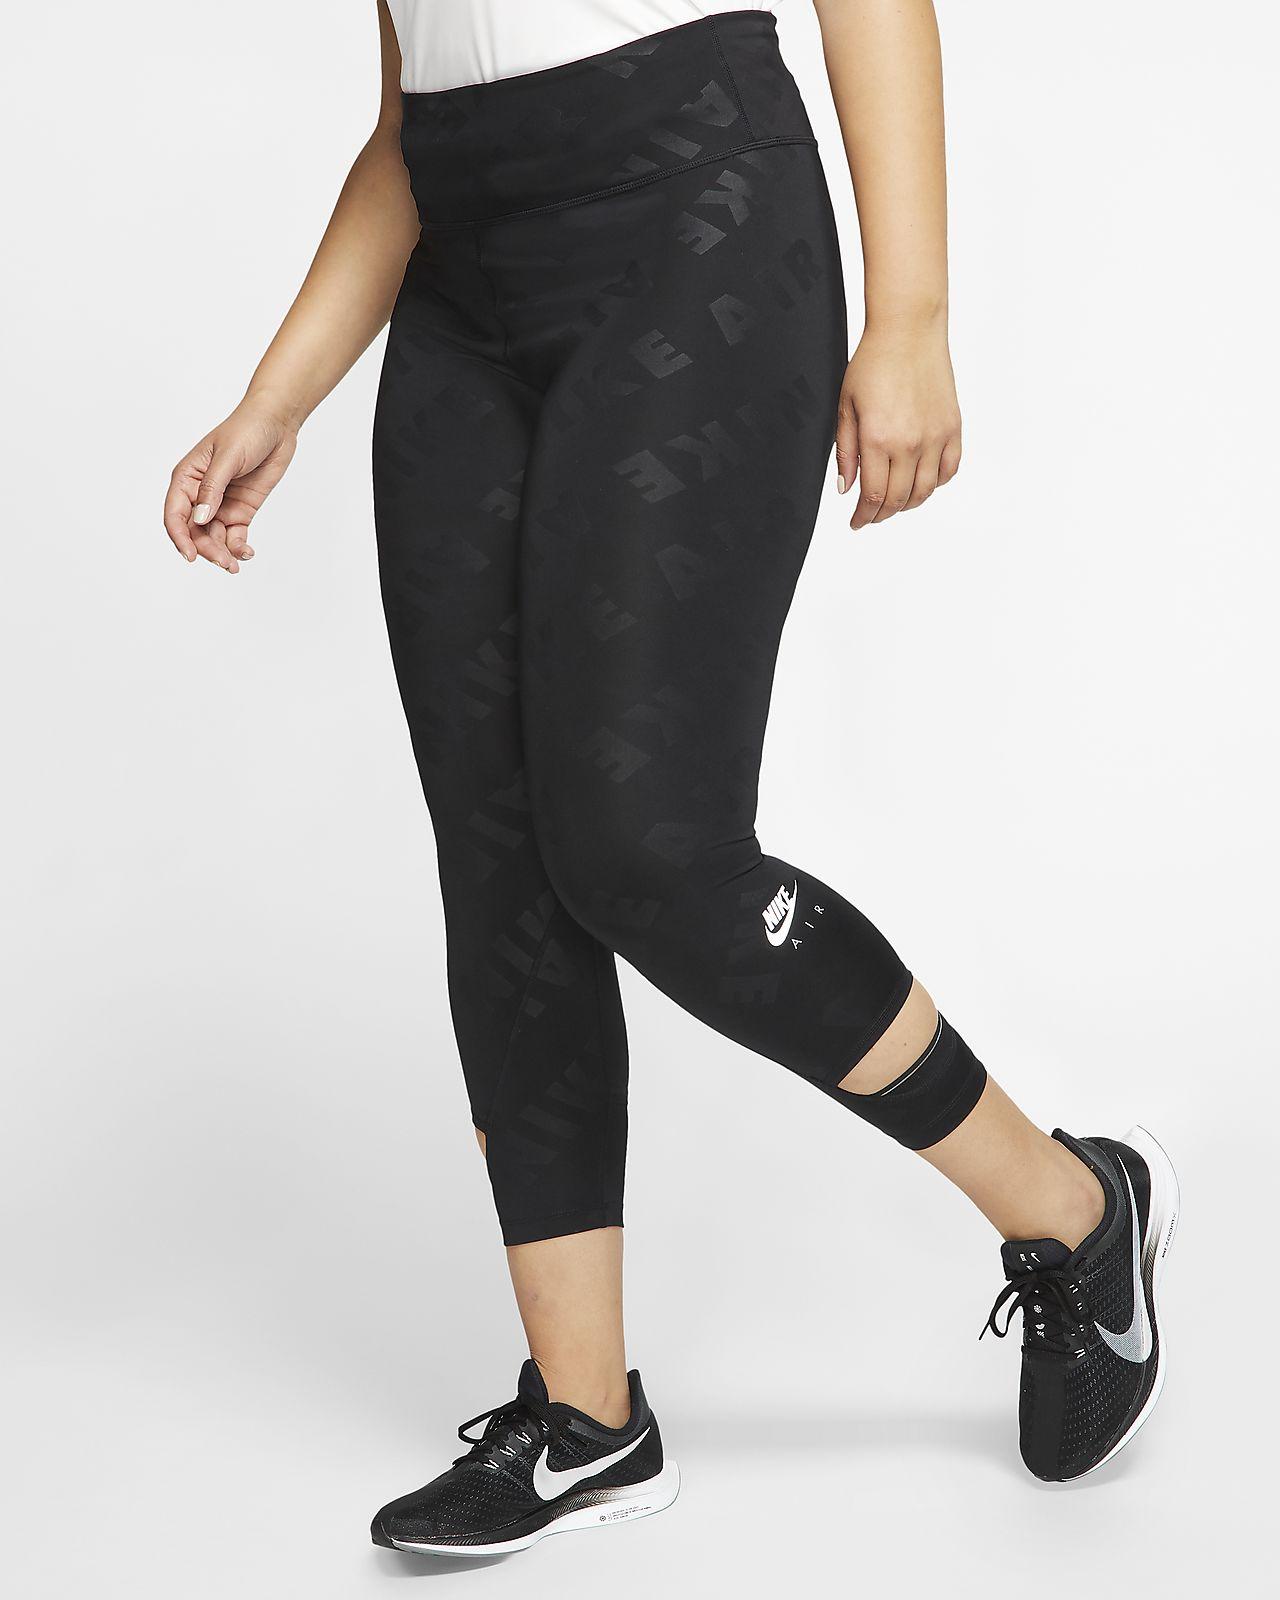 Damskie legginsy do biegania 78 Nike Air (duże rozmiary). Nike PL